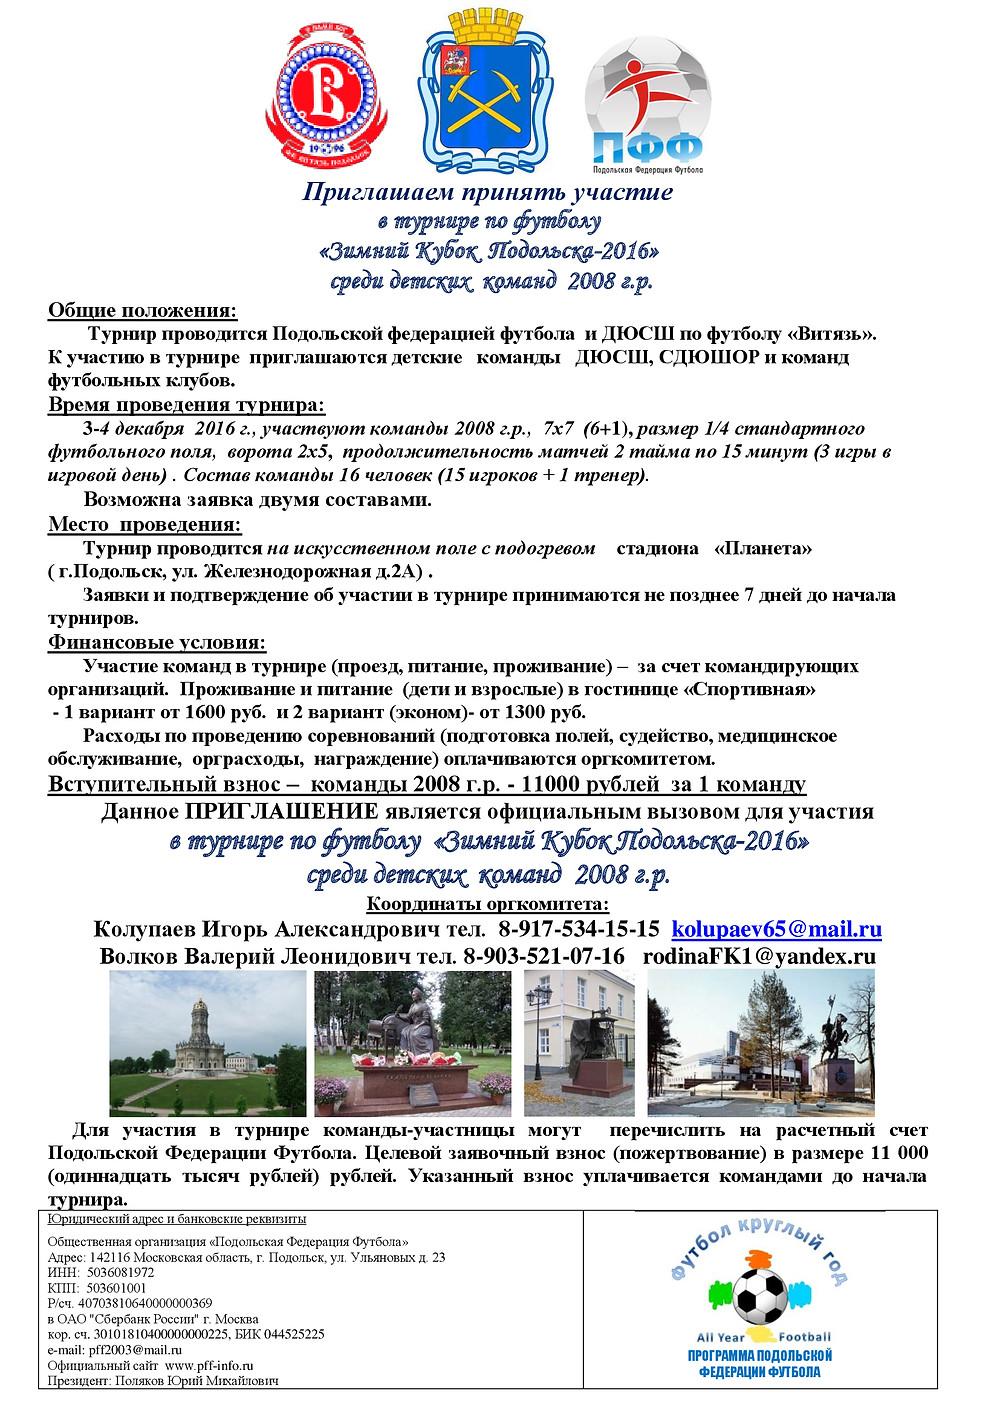 Зимний кубок Подольска 2016